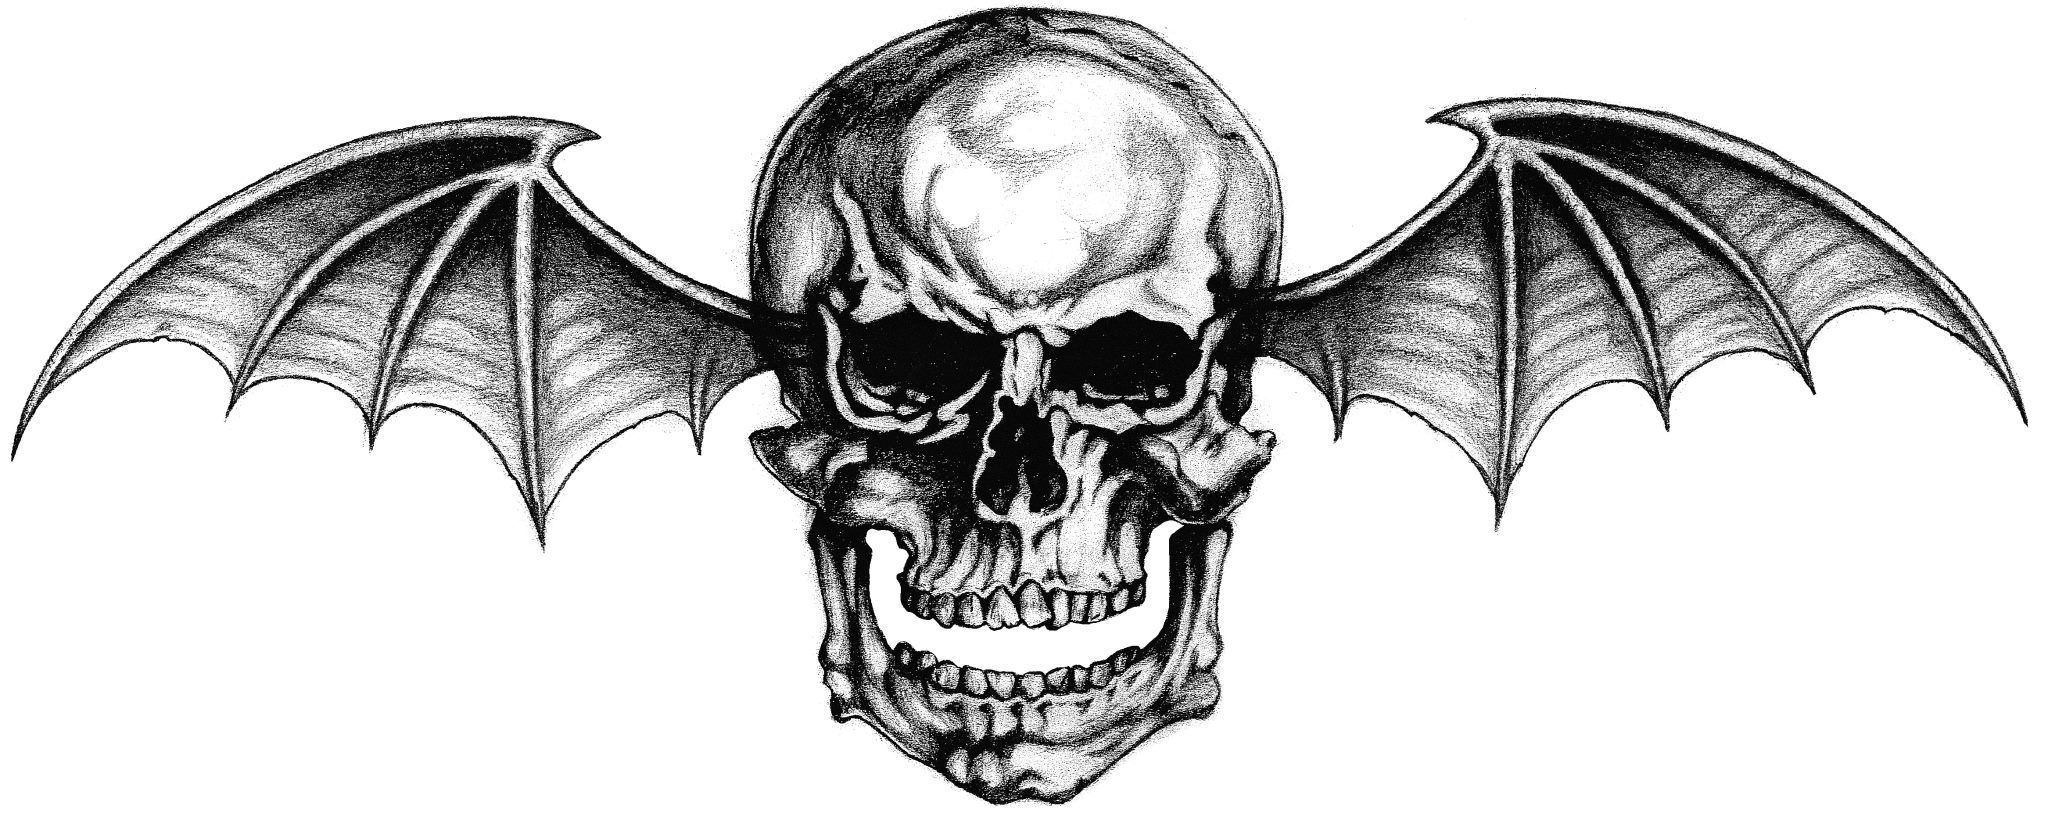 Avenged Sevenfold deathbat logo Avenged sevenfold tattoo